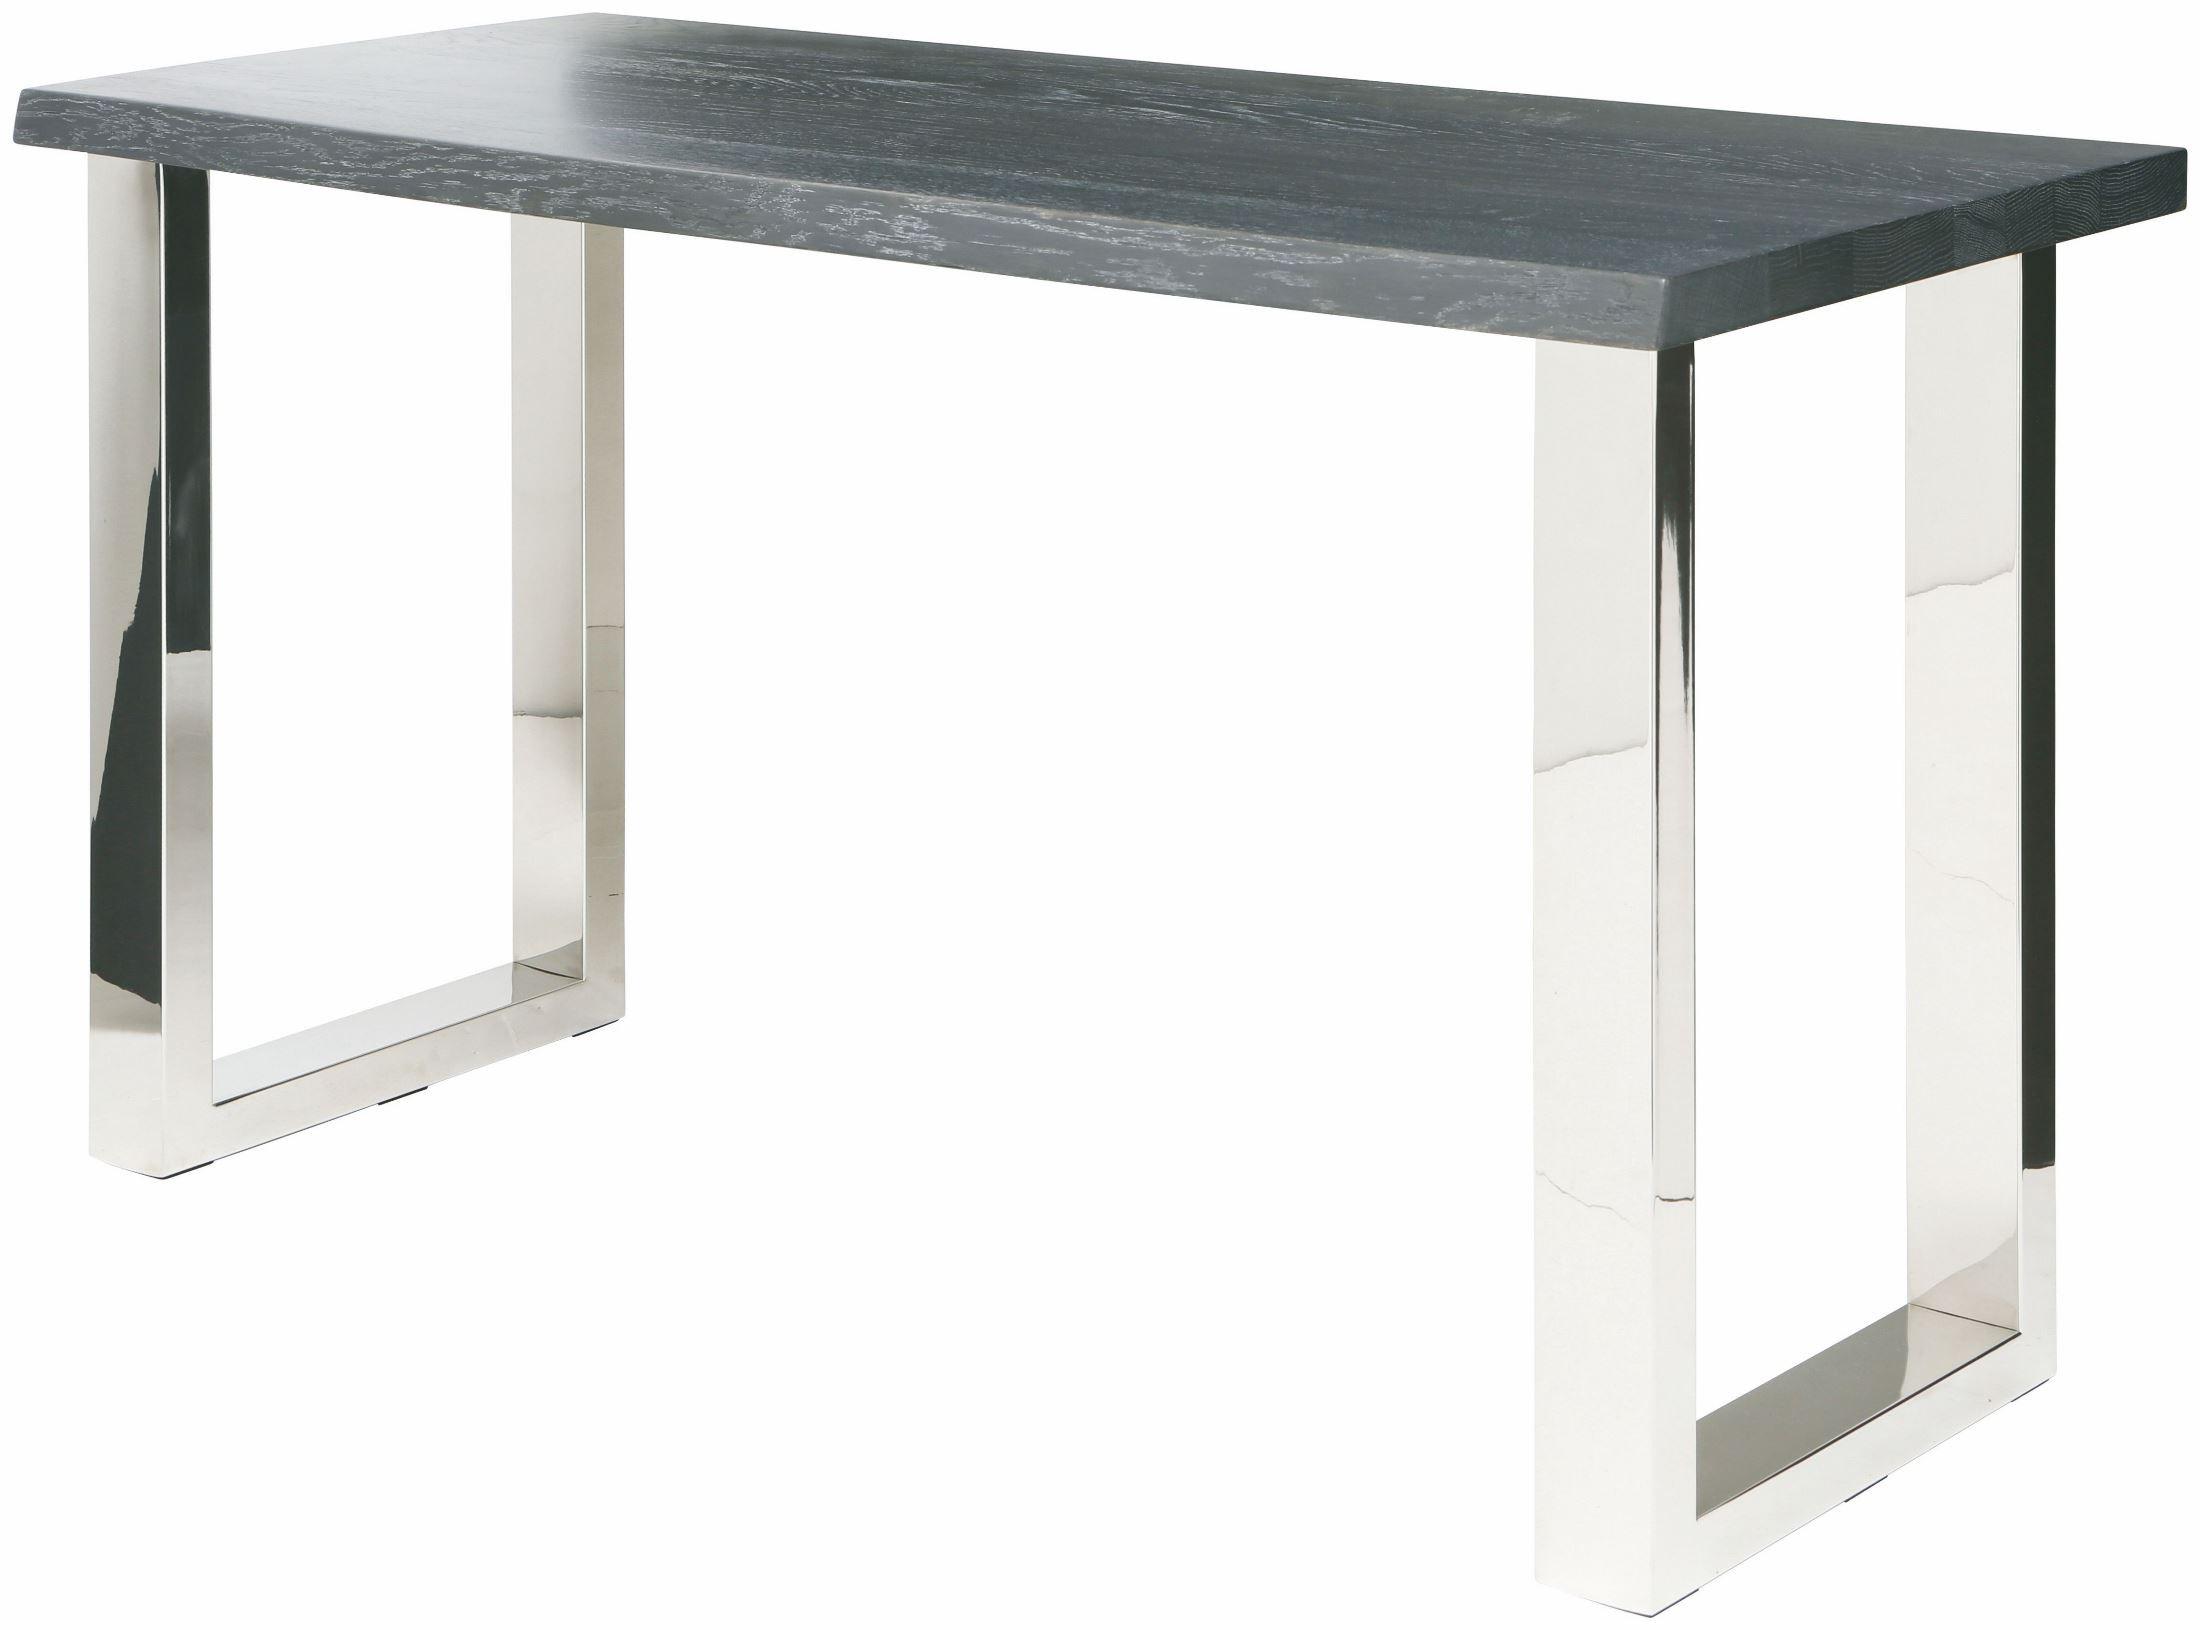 Lyon oxidized grey wood console table hgsr337 nuevo for Sofa table grey